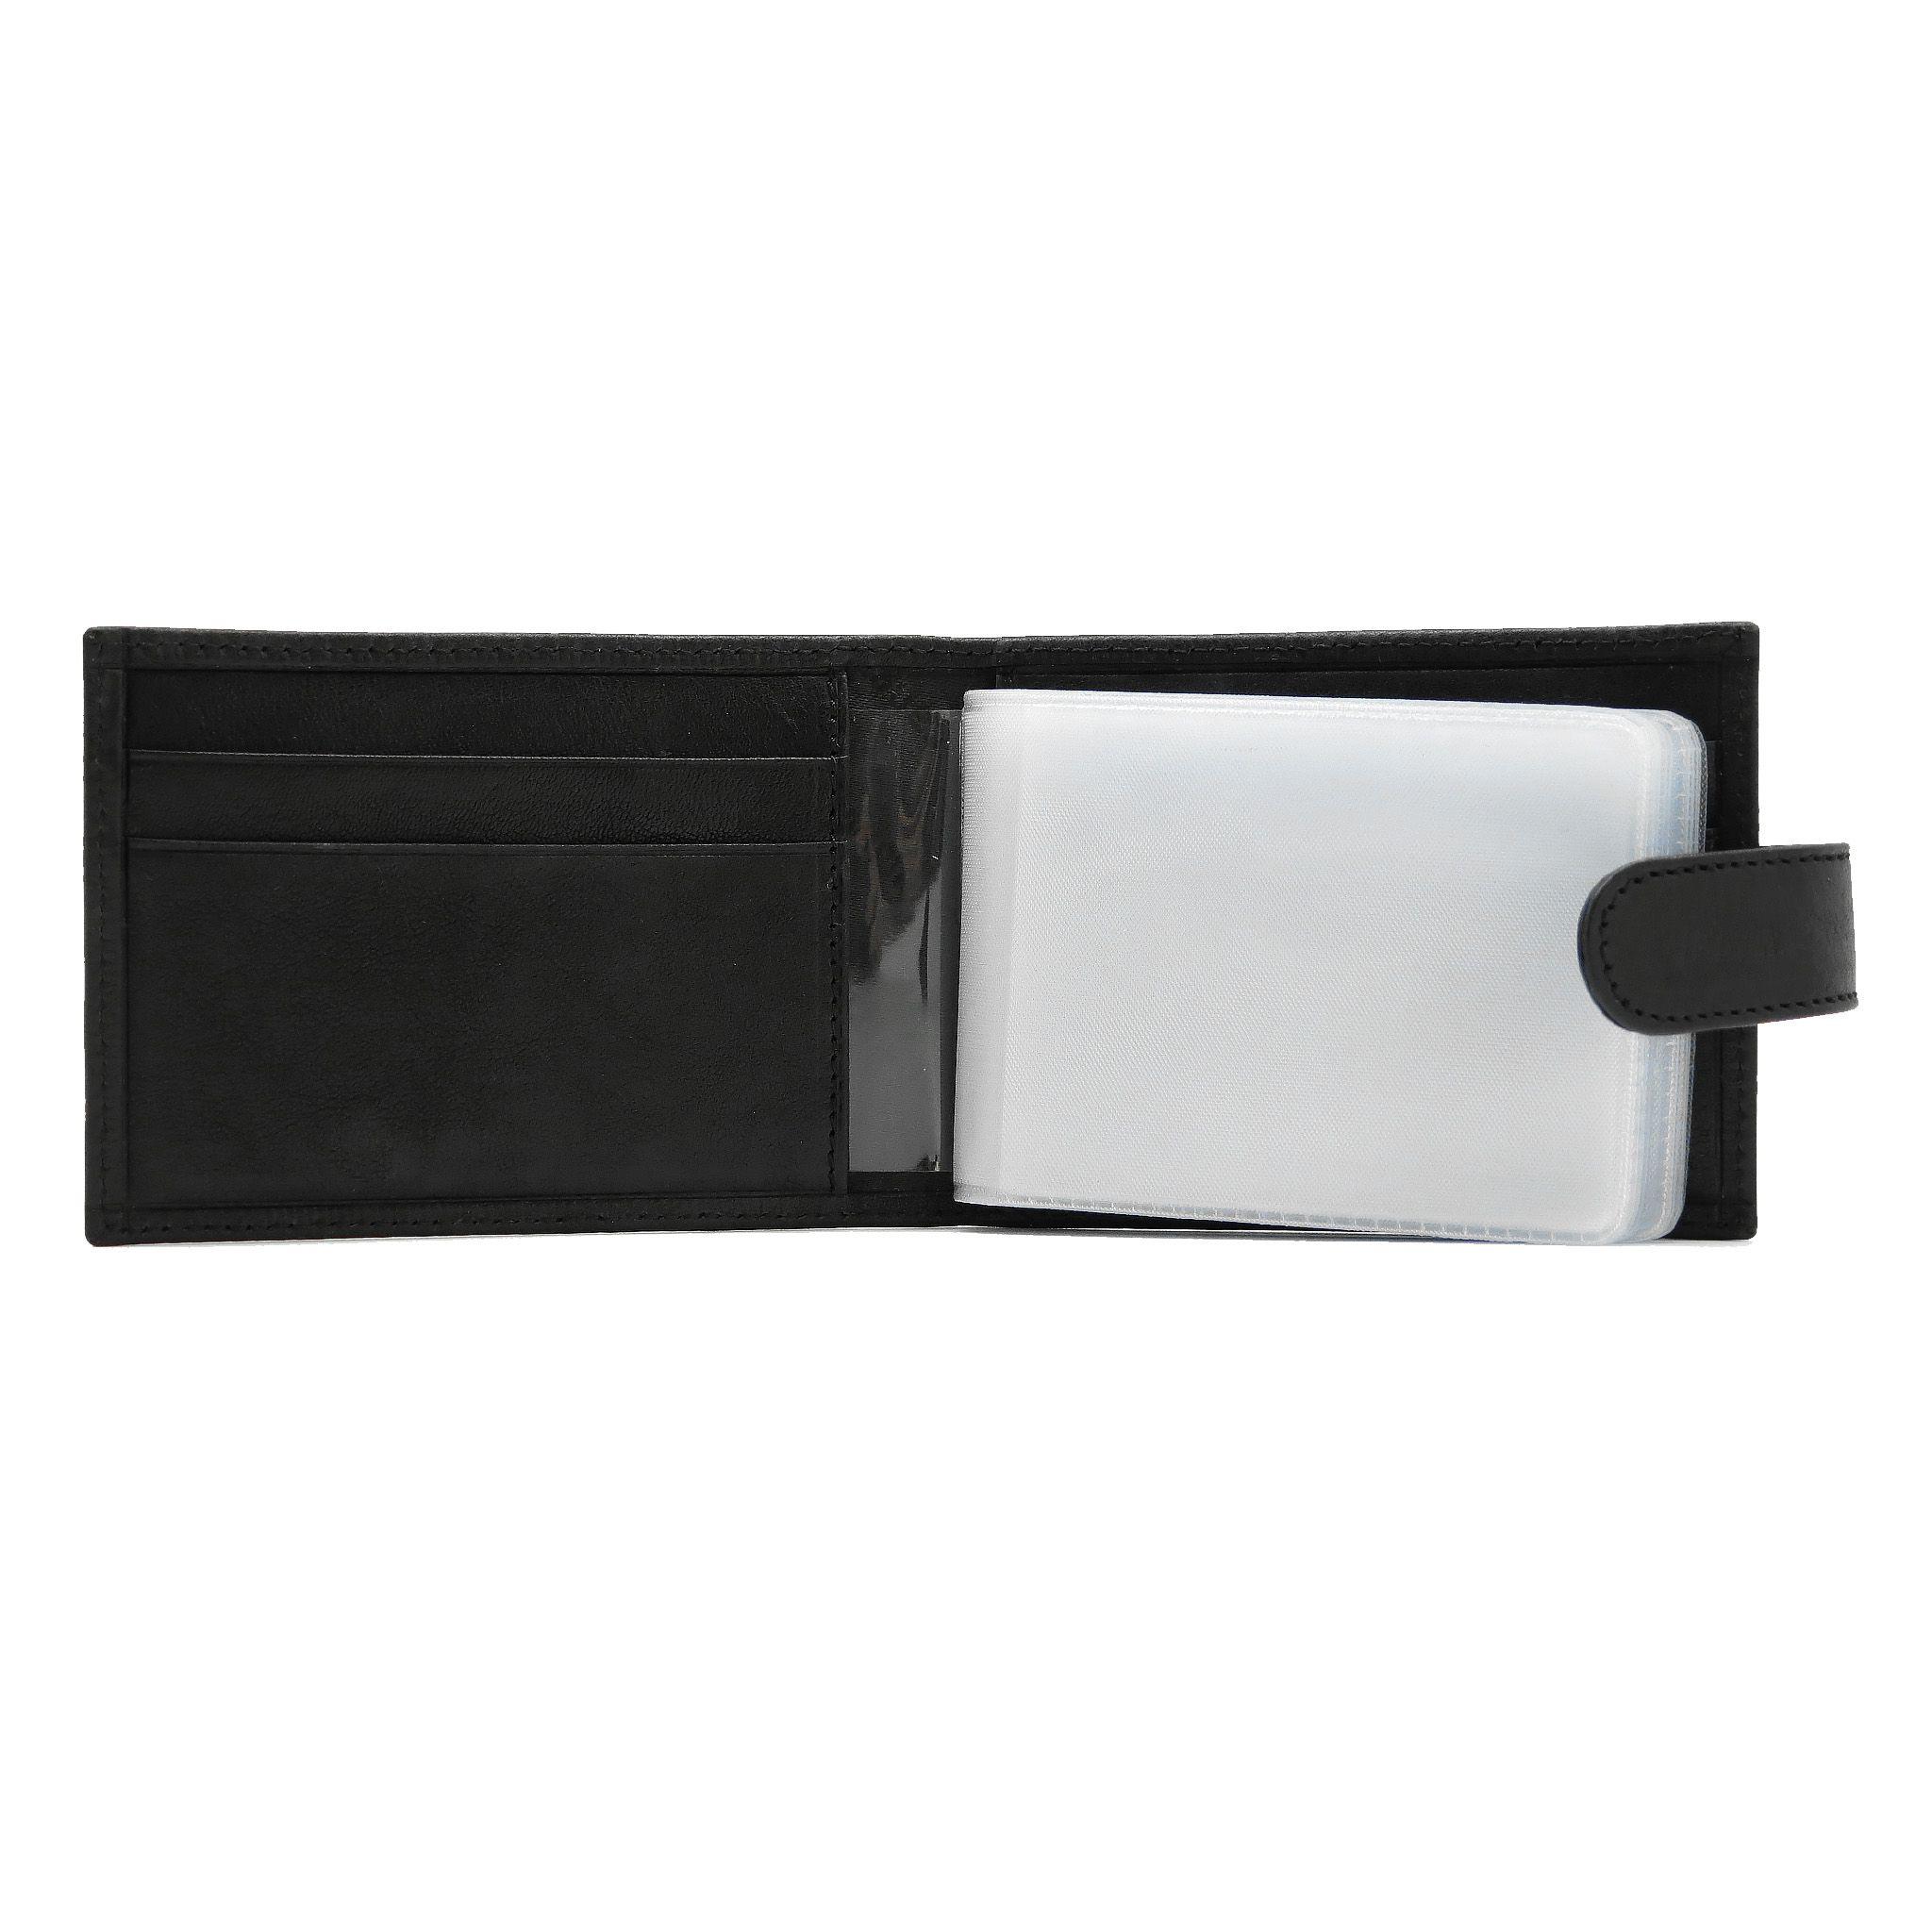 accessories leather black handmade cardholder